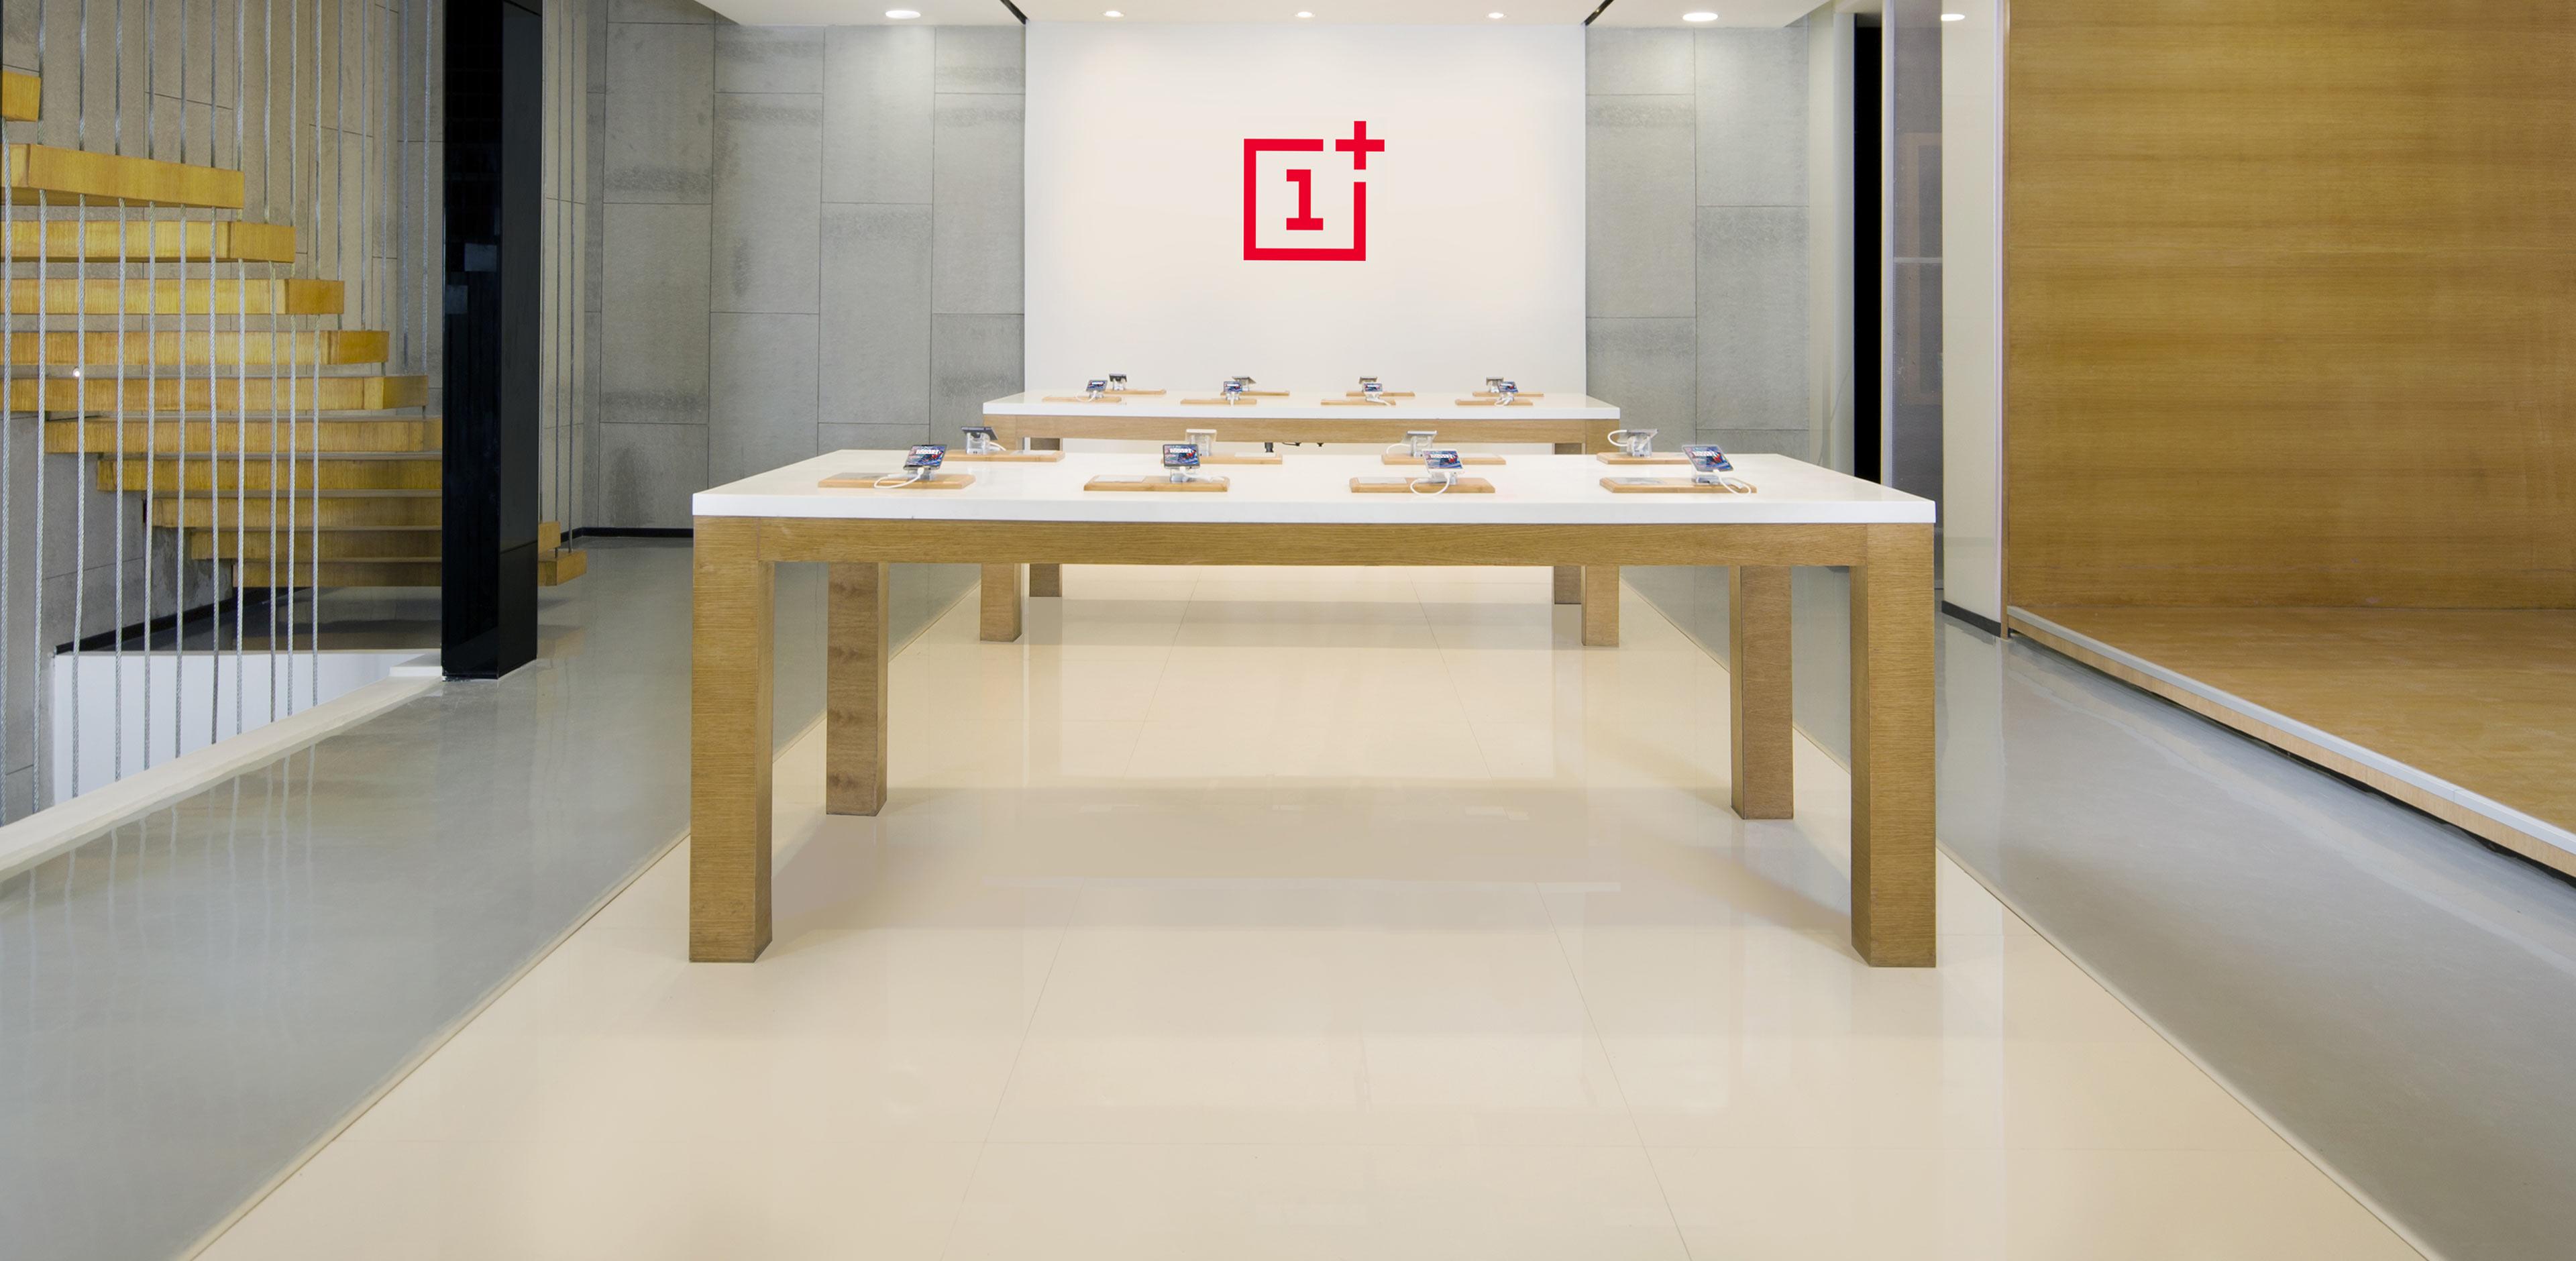 OnePlus Authorized Stores - OnePlus (India)